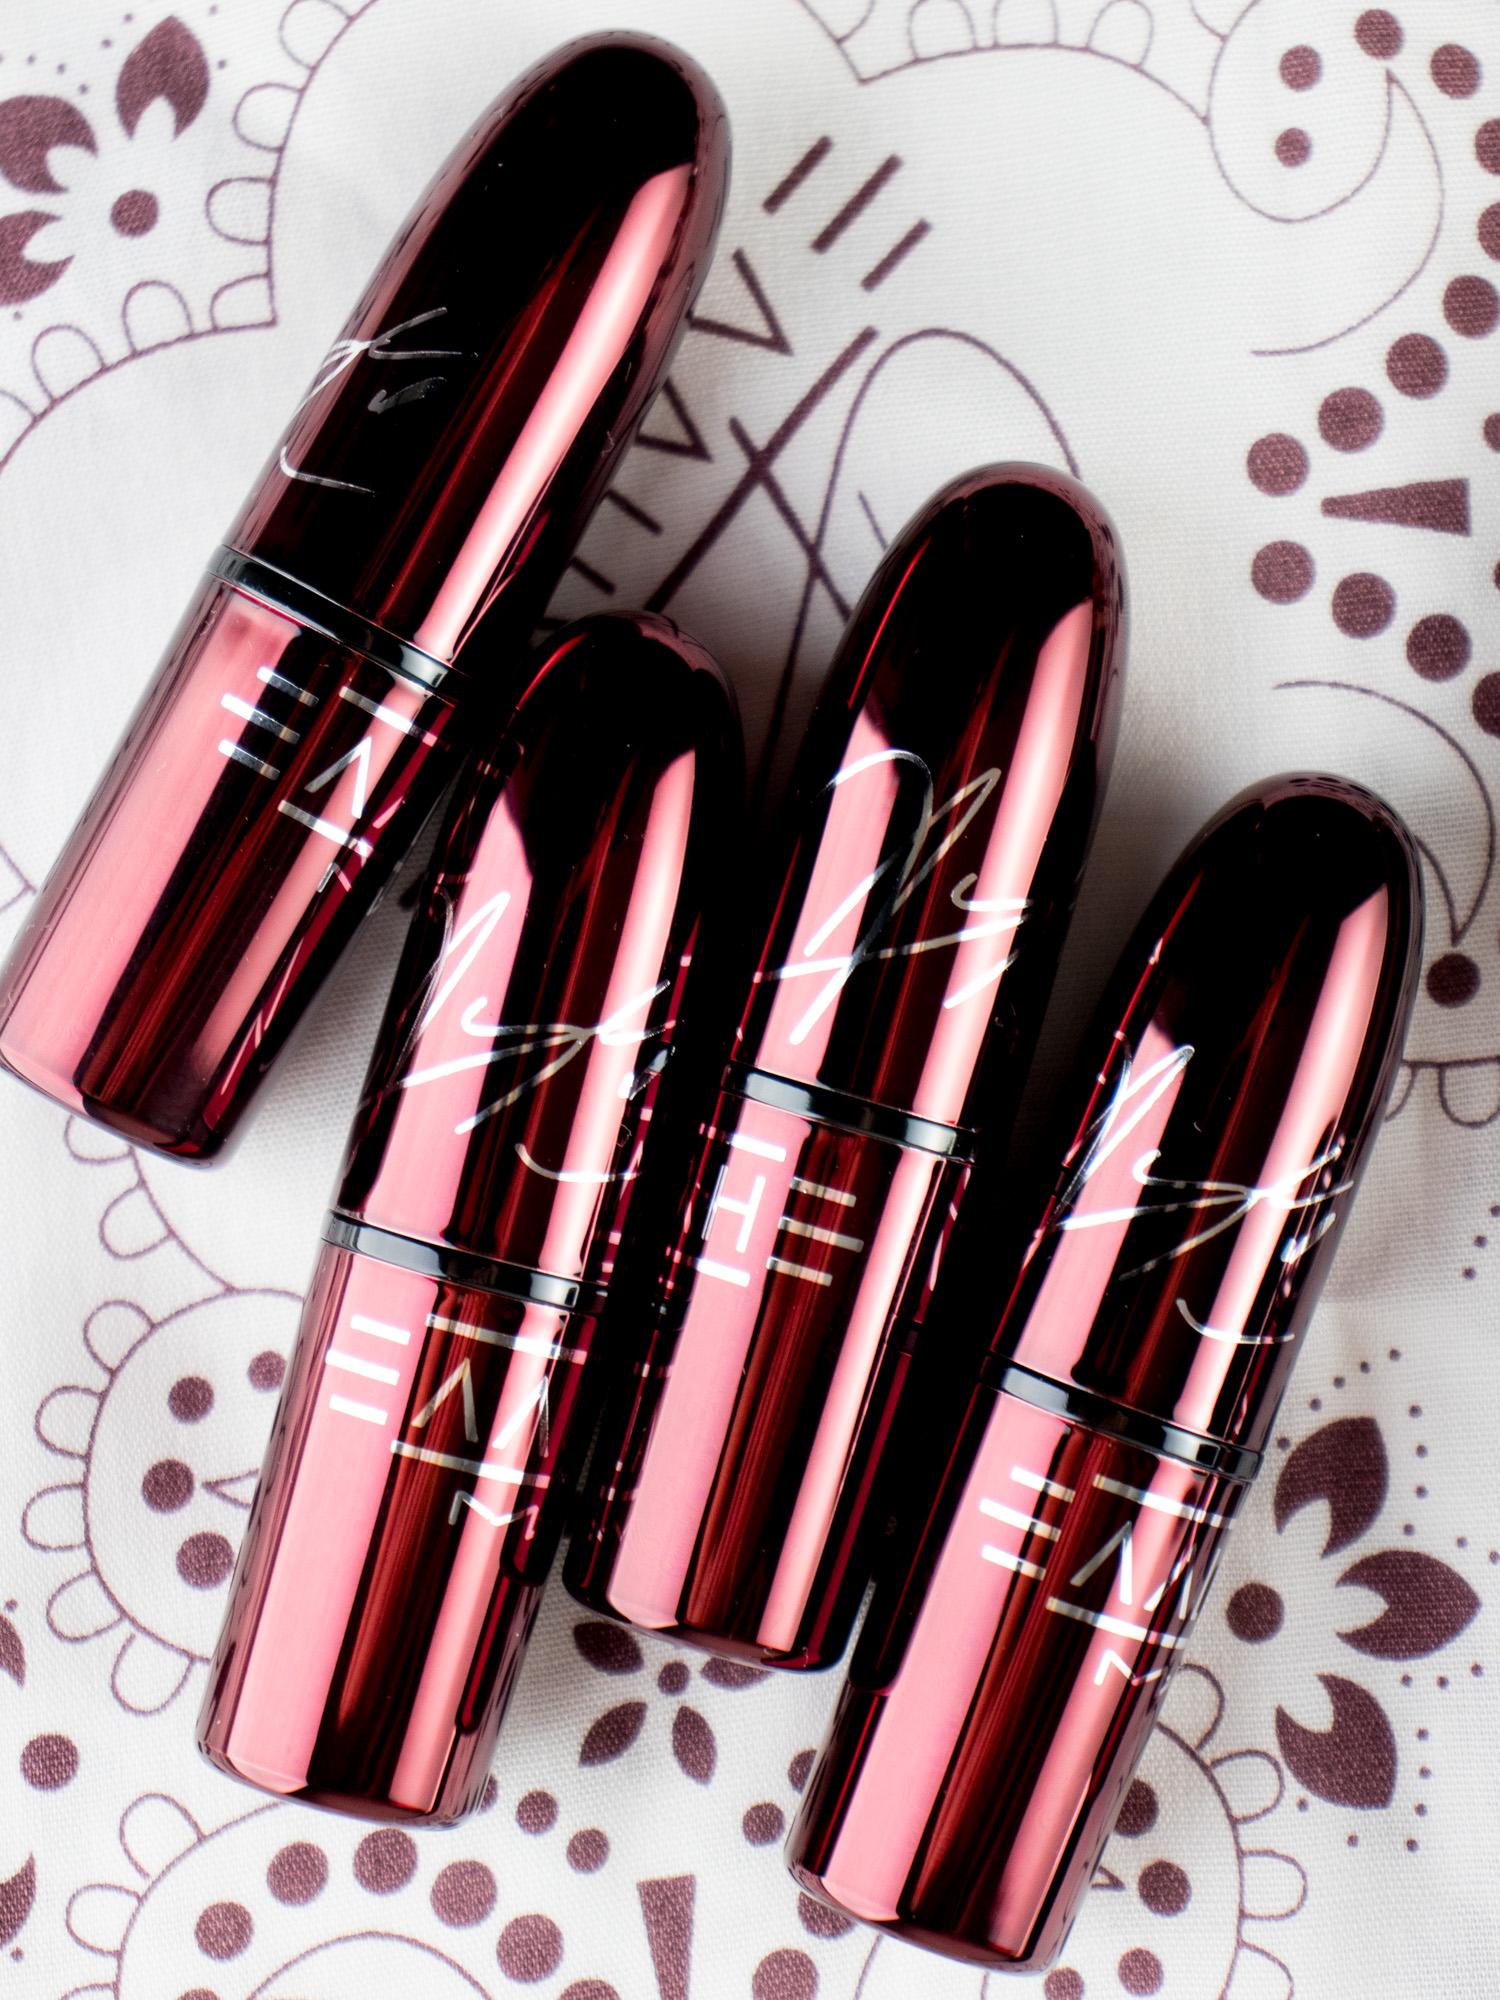 MAC X Aaliyah Collection Lipsticks